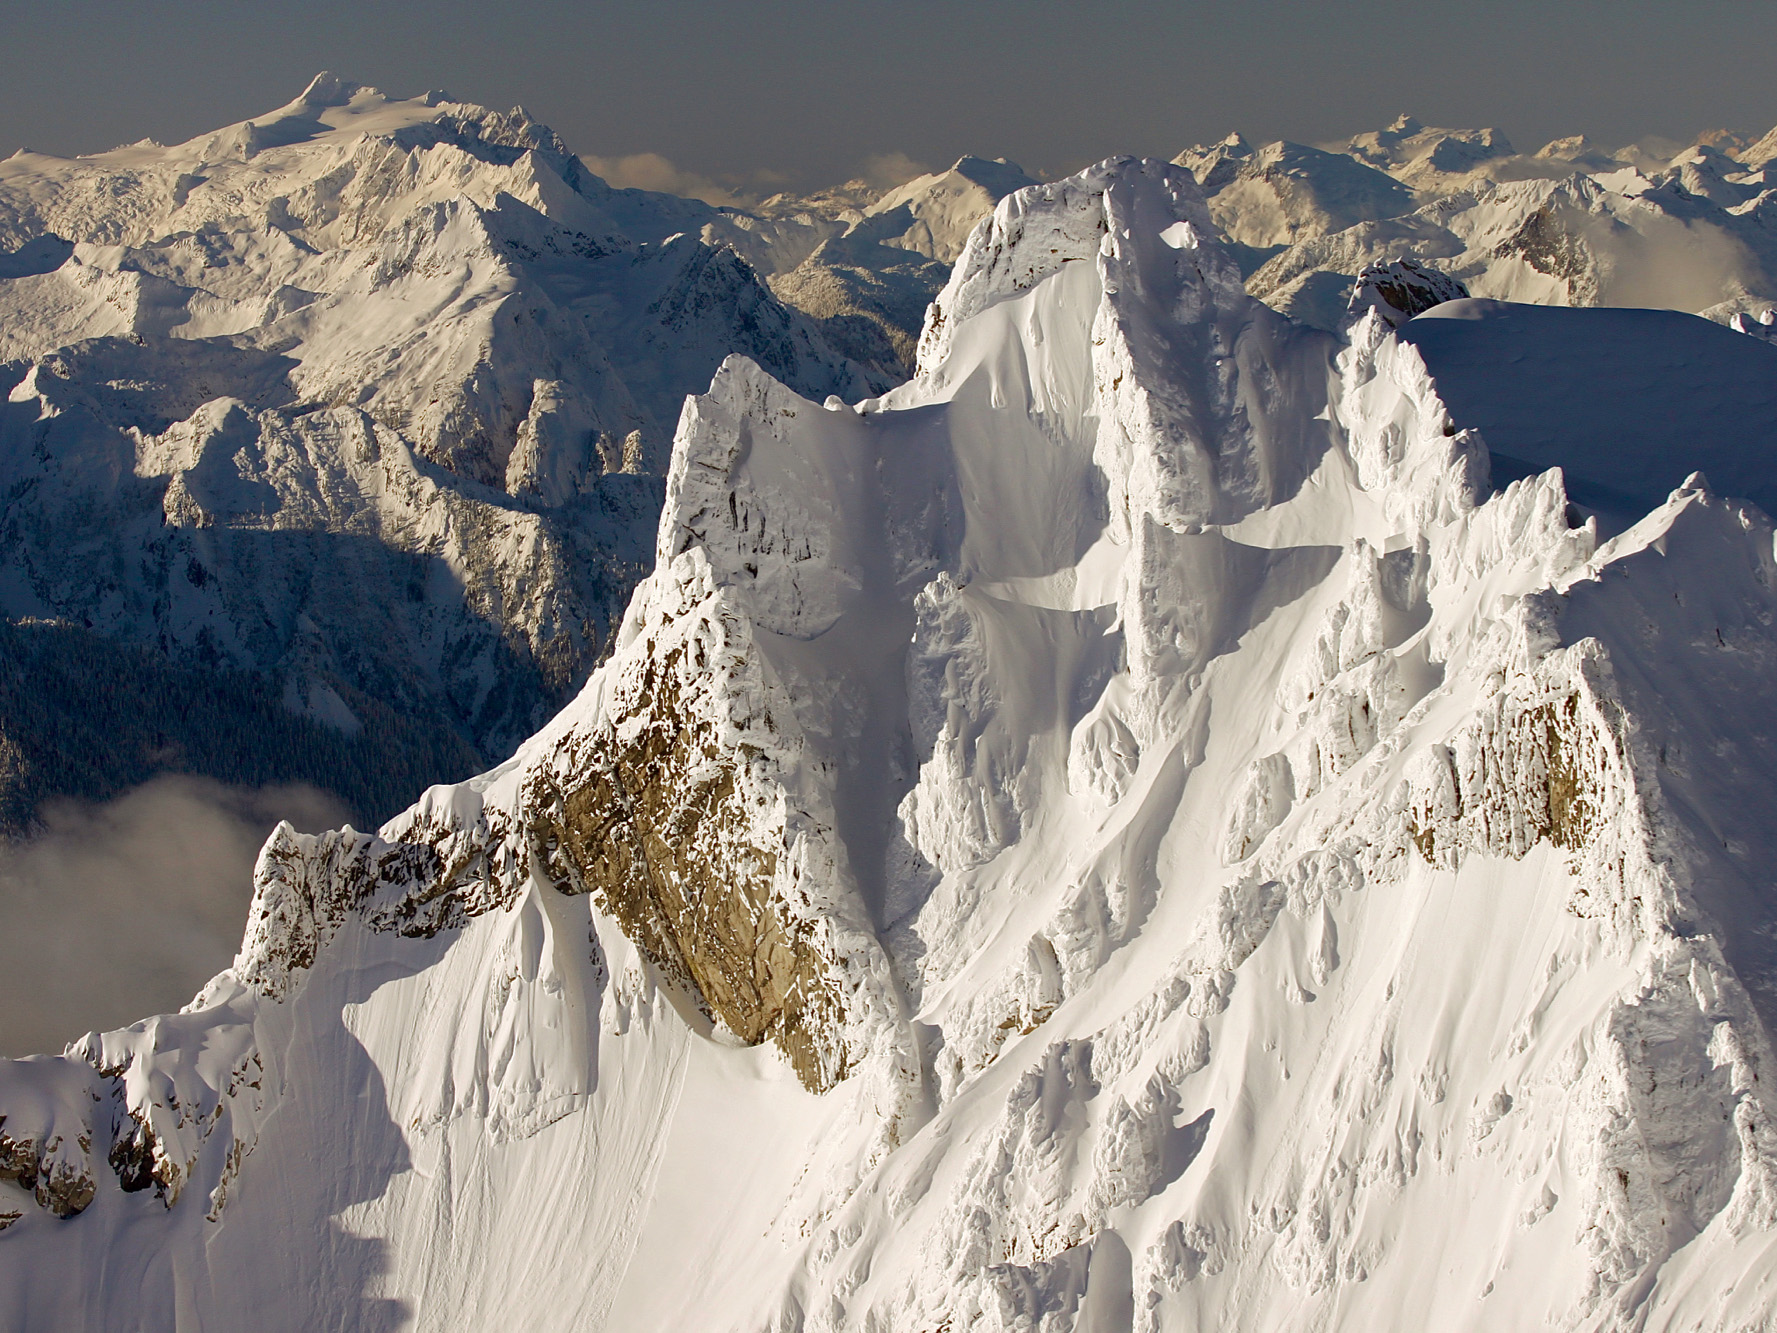 Distant Mt Shuksan